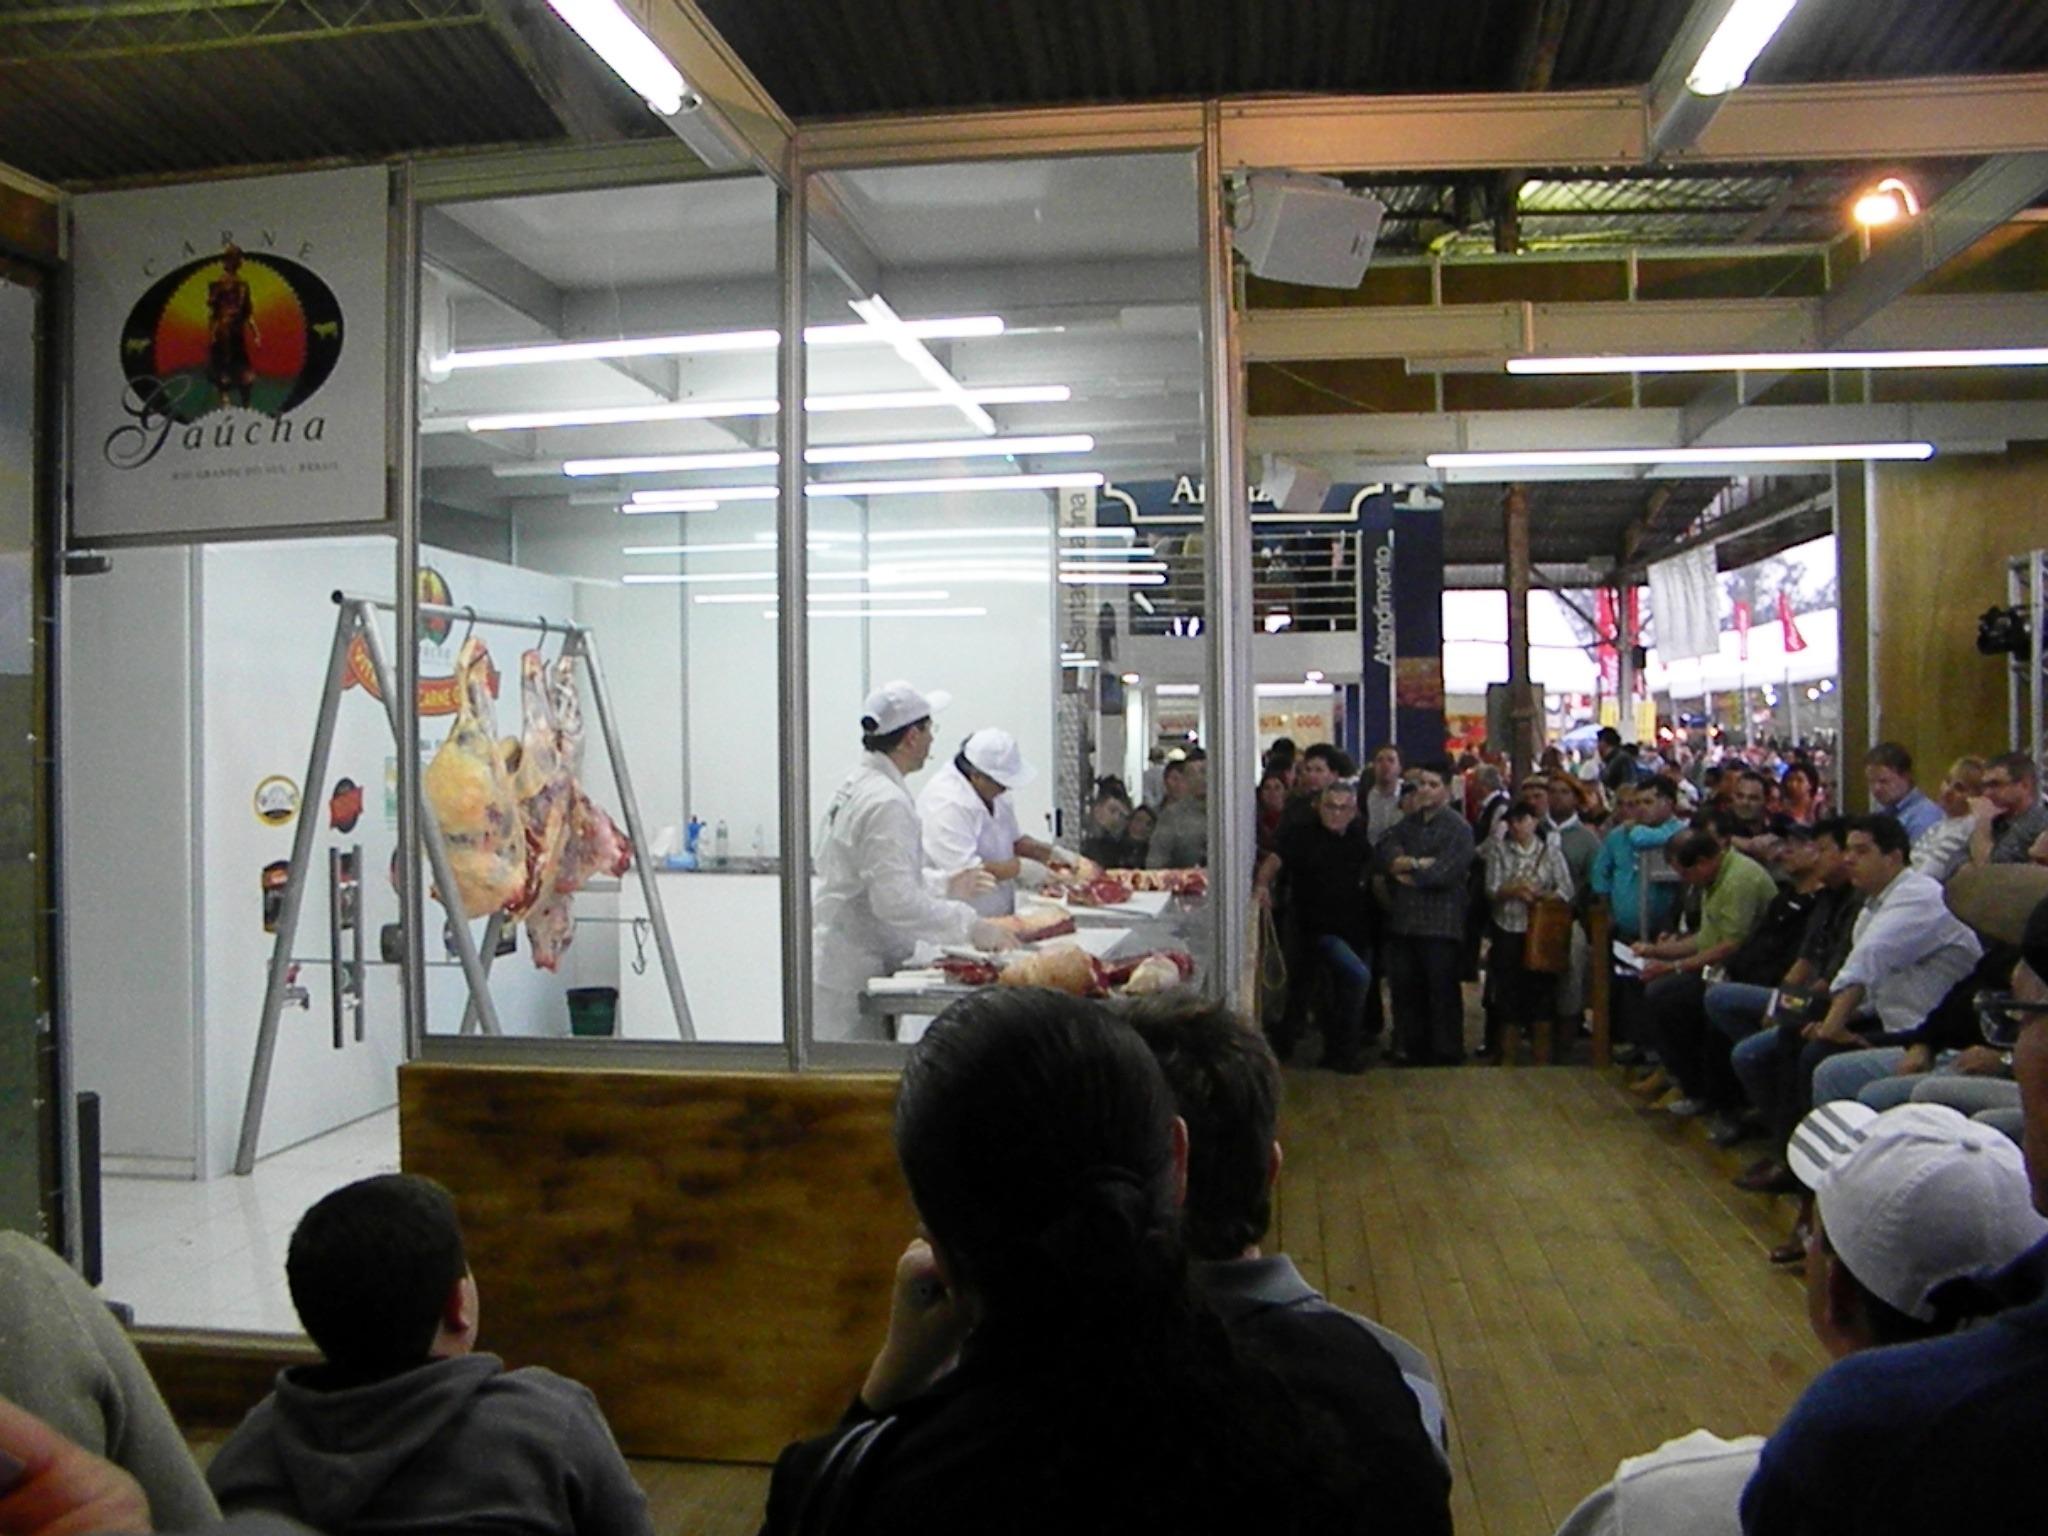 Sebrae Mercados, Expointer 2014, Carne Gaucha